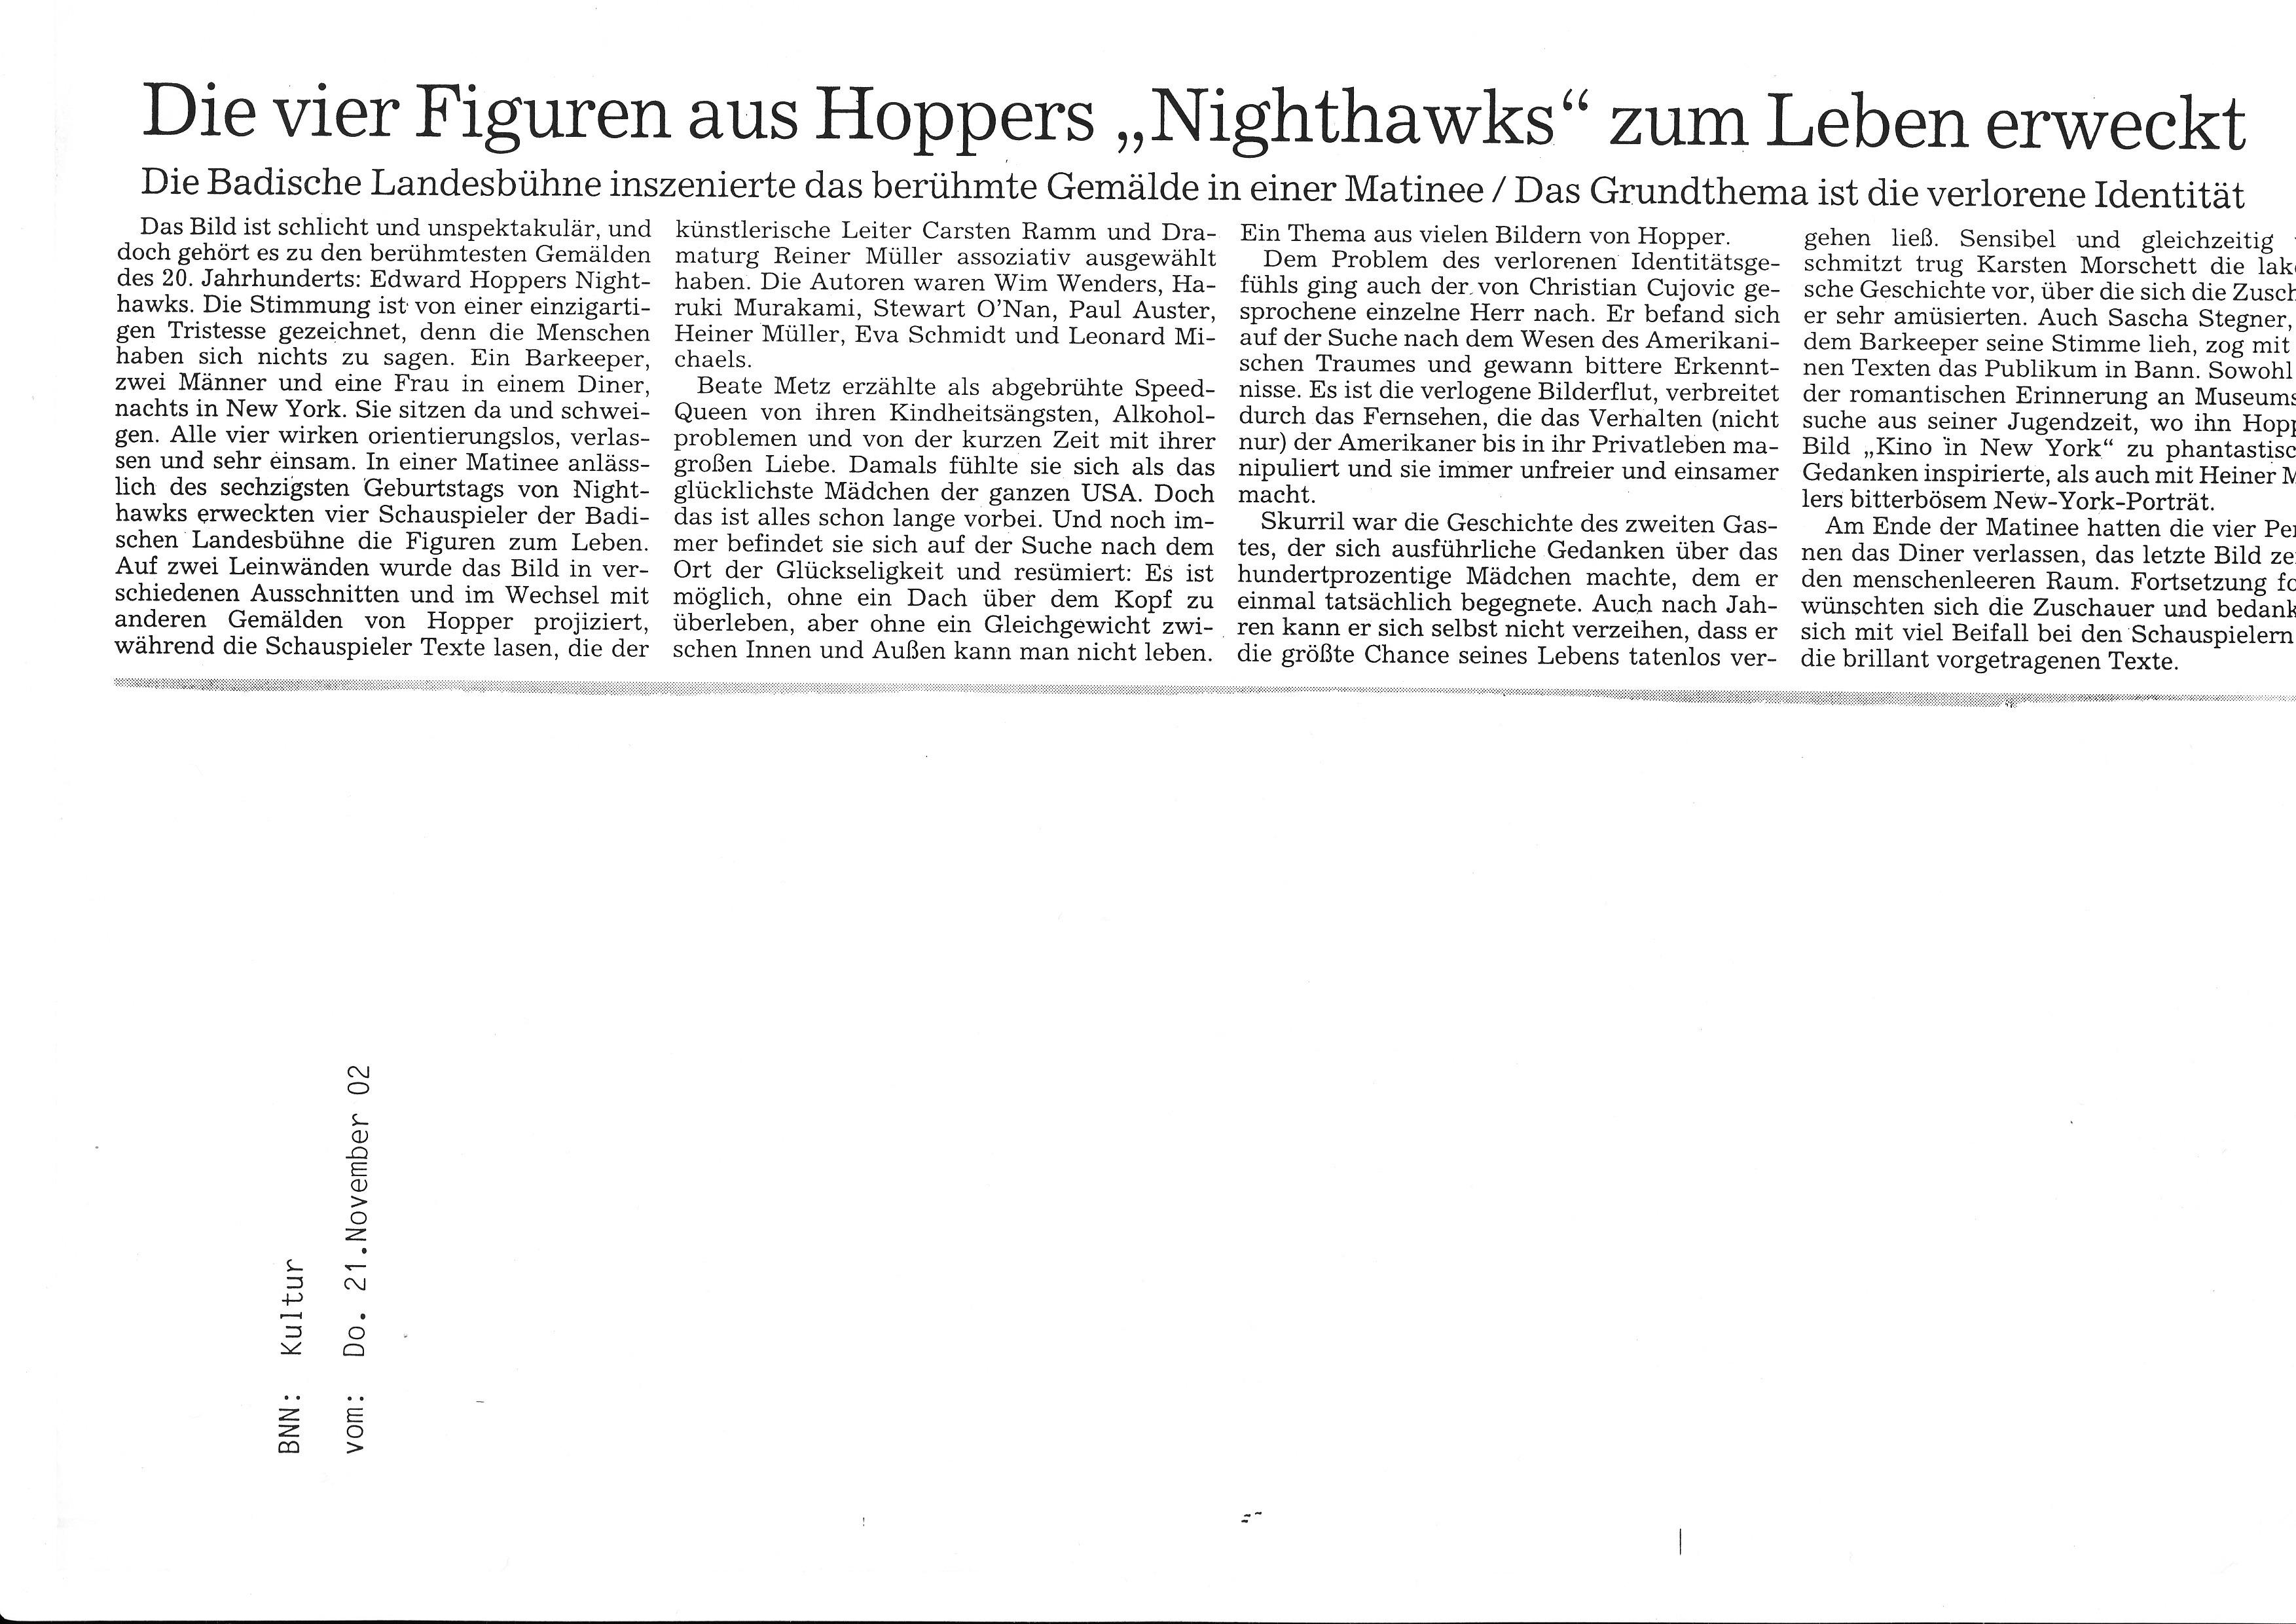 2002_11_21 Matinee Nighthawks